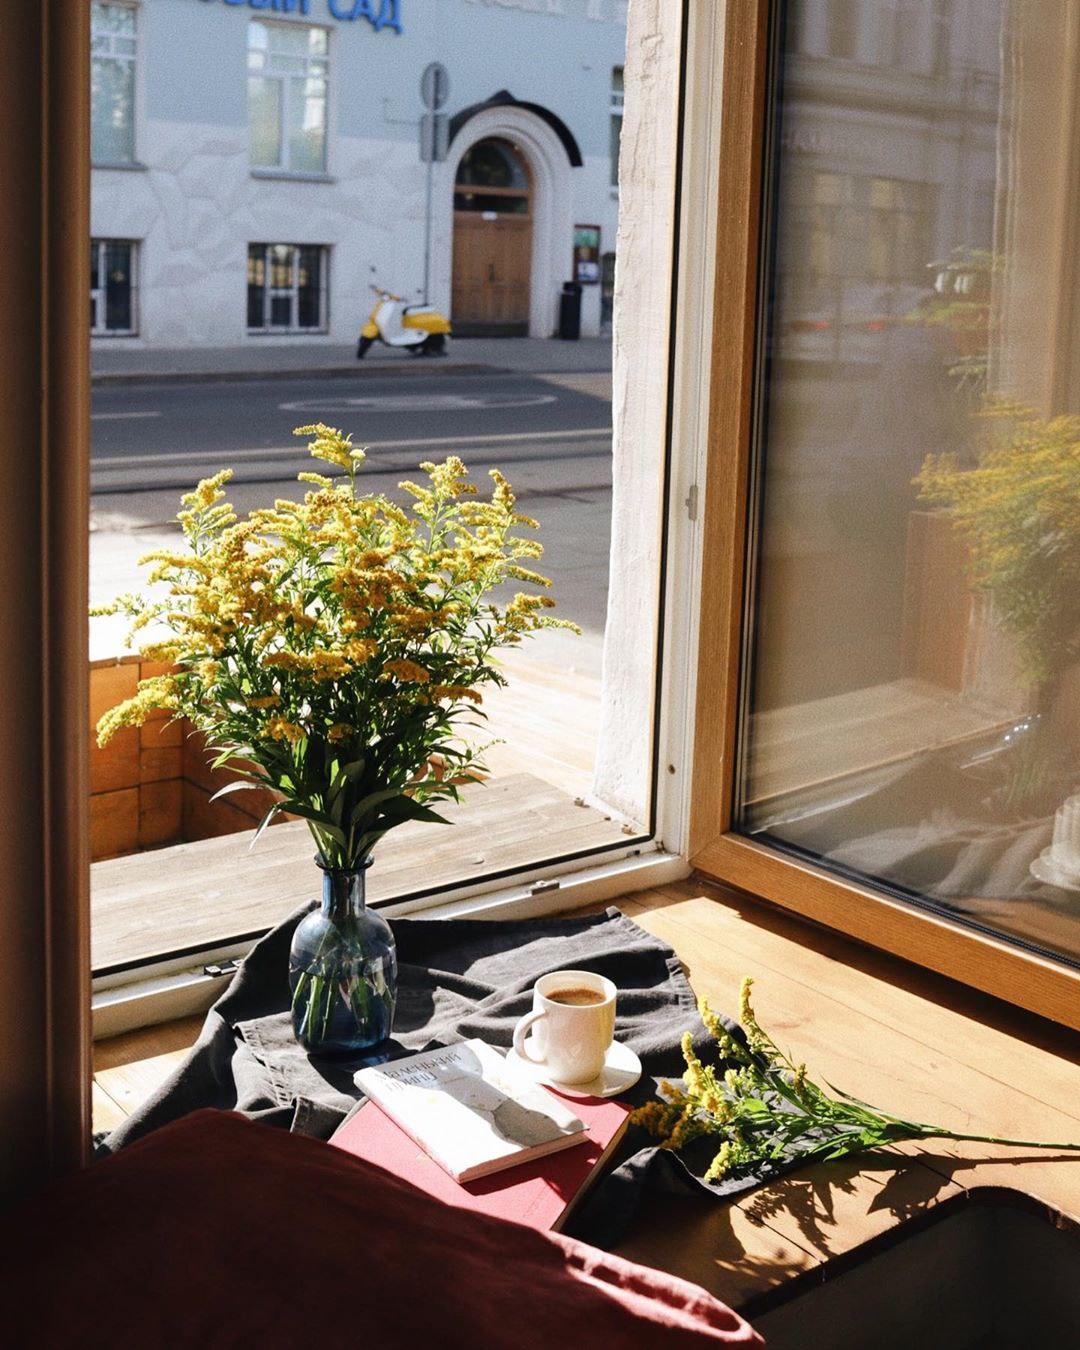 Латте, цветы и книги в hygge кофейне Розетка и кофе